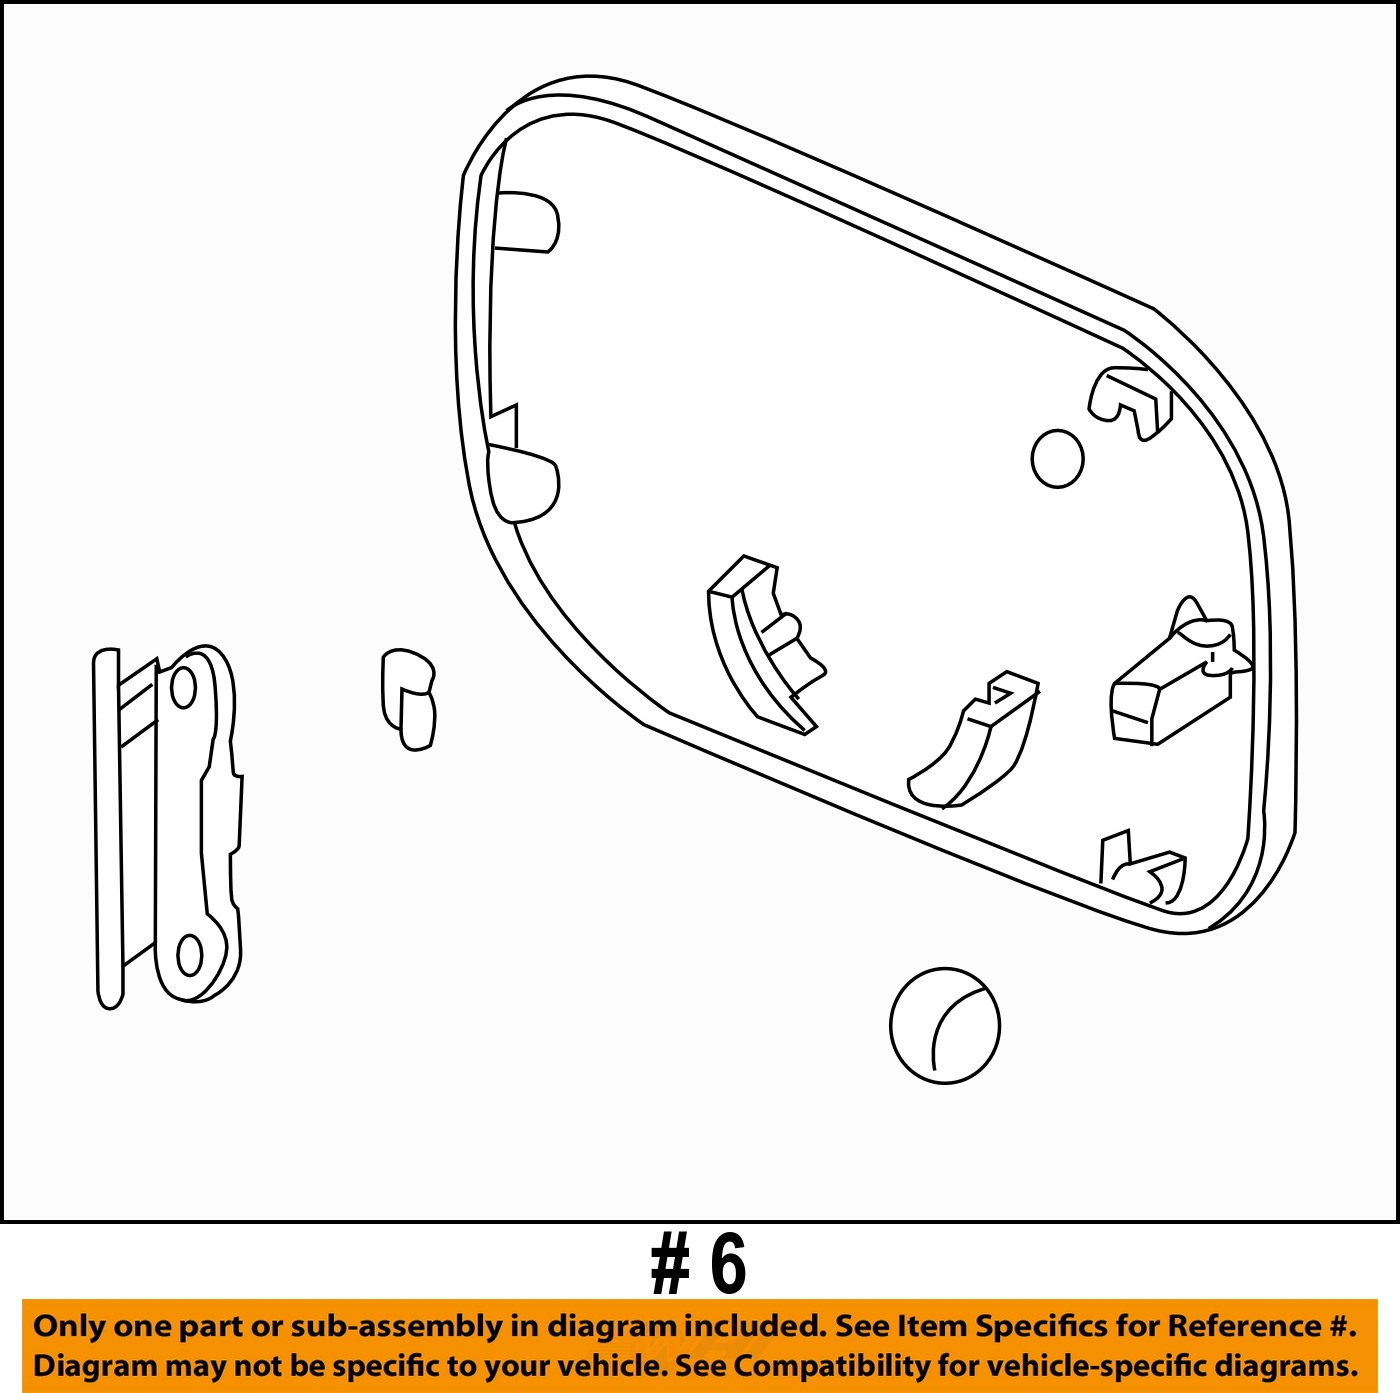 2004 aveo horn diagram wiring diagram srconds  04 chevy aveo exhaust wiring diagram #14